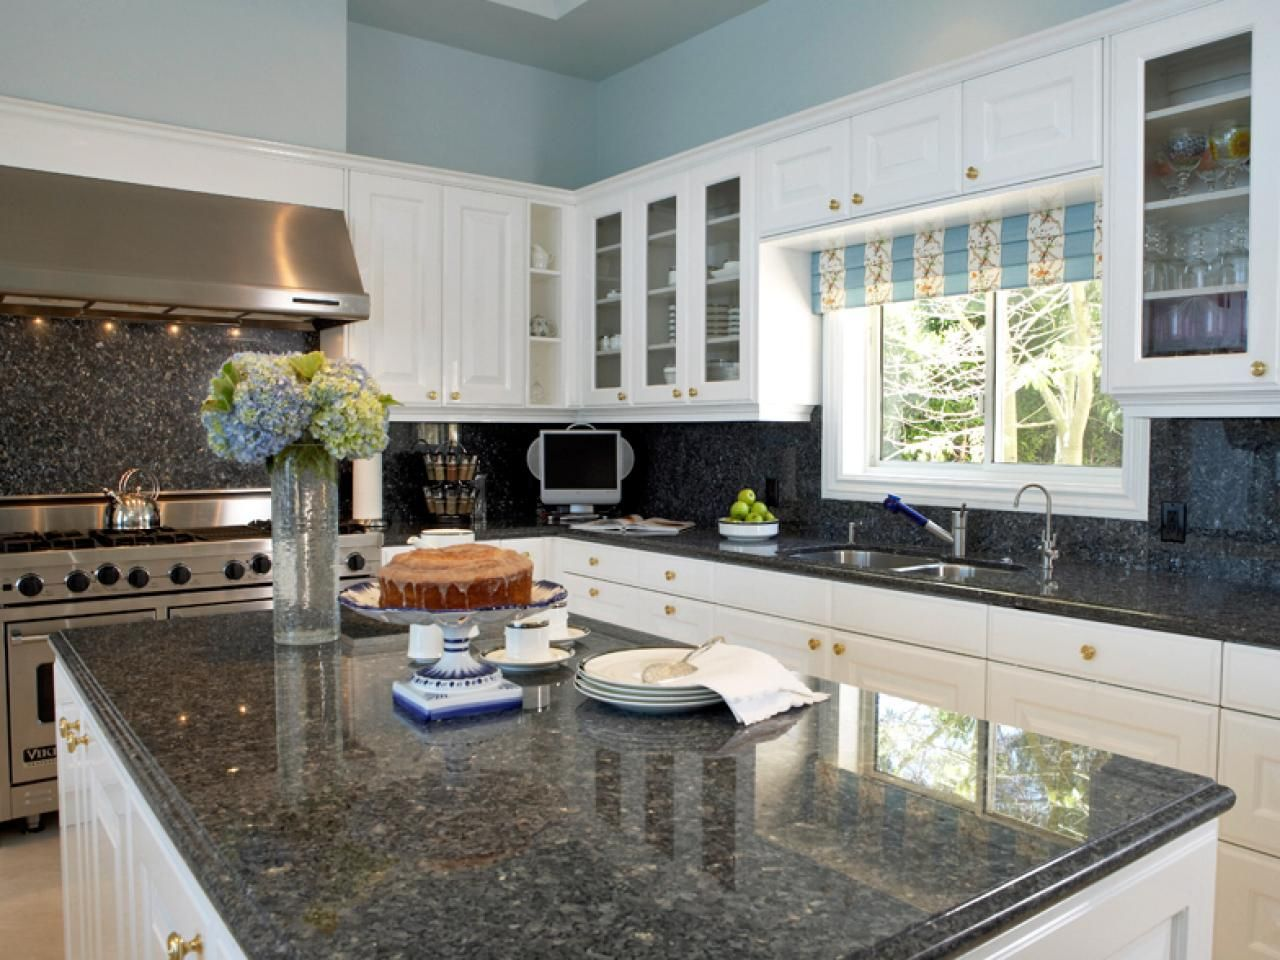 100+ Light Colored Granite Kitchen Countertops - Ideas for Kitchen ...